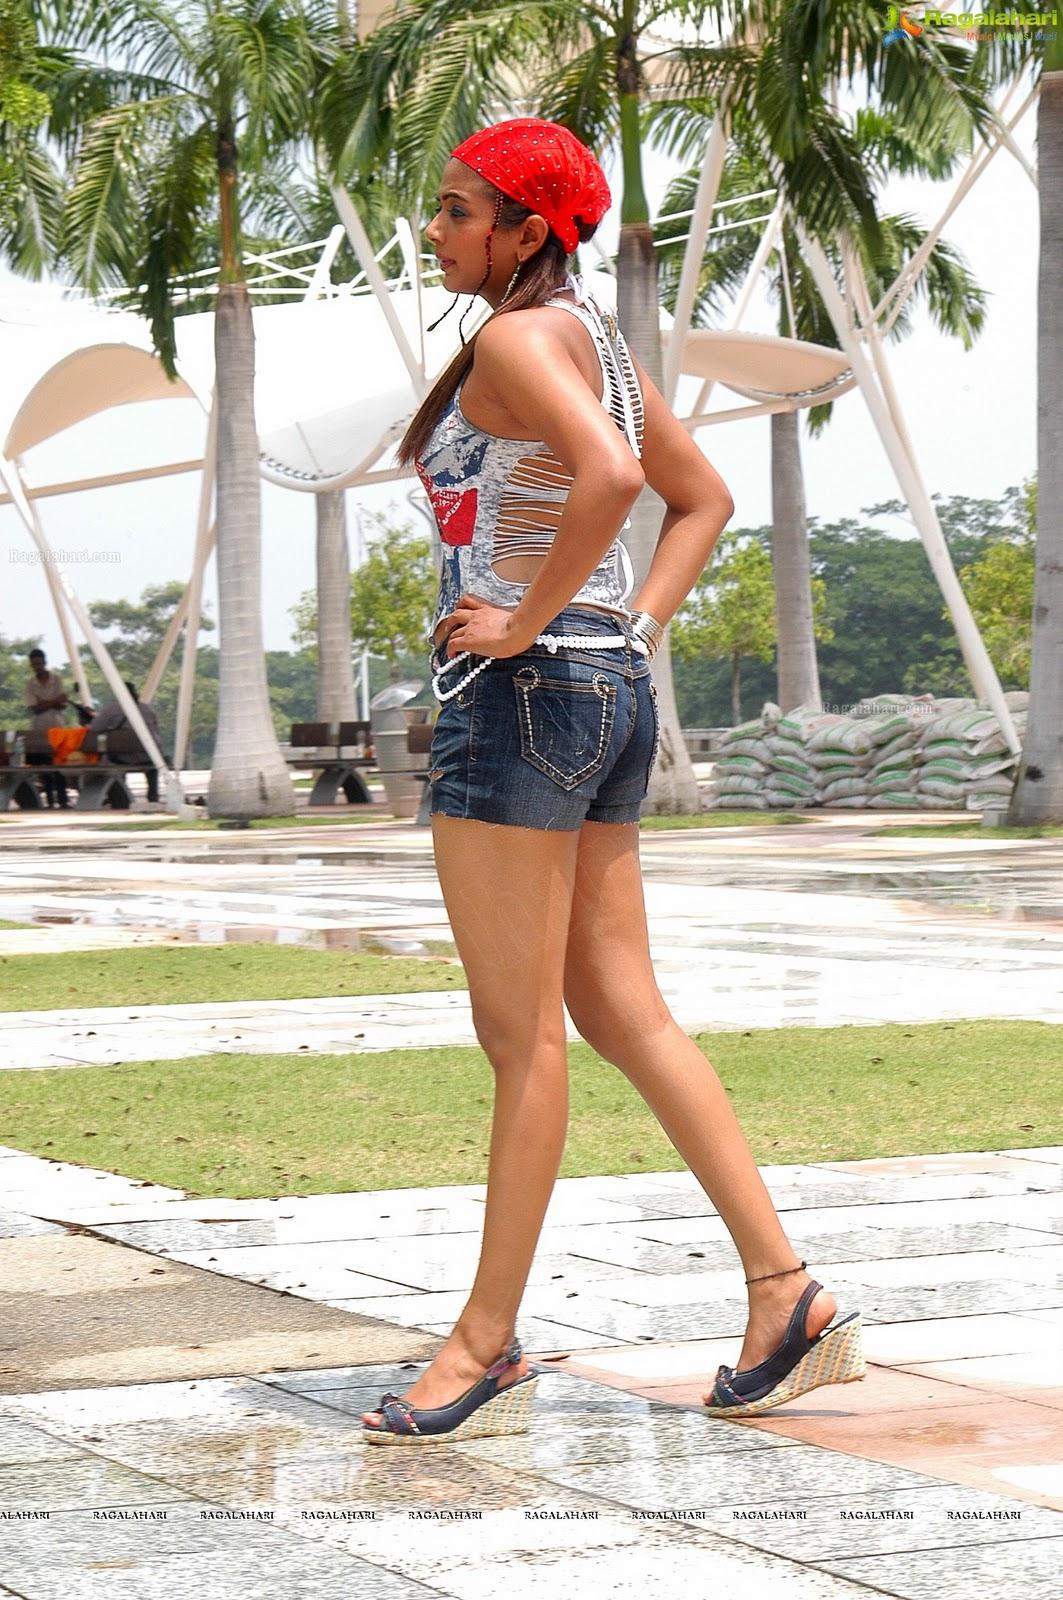 hot body shapes of priyamani in skirt